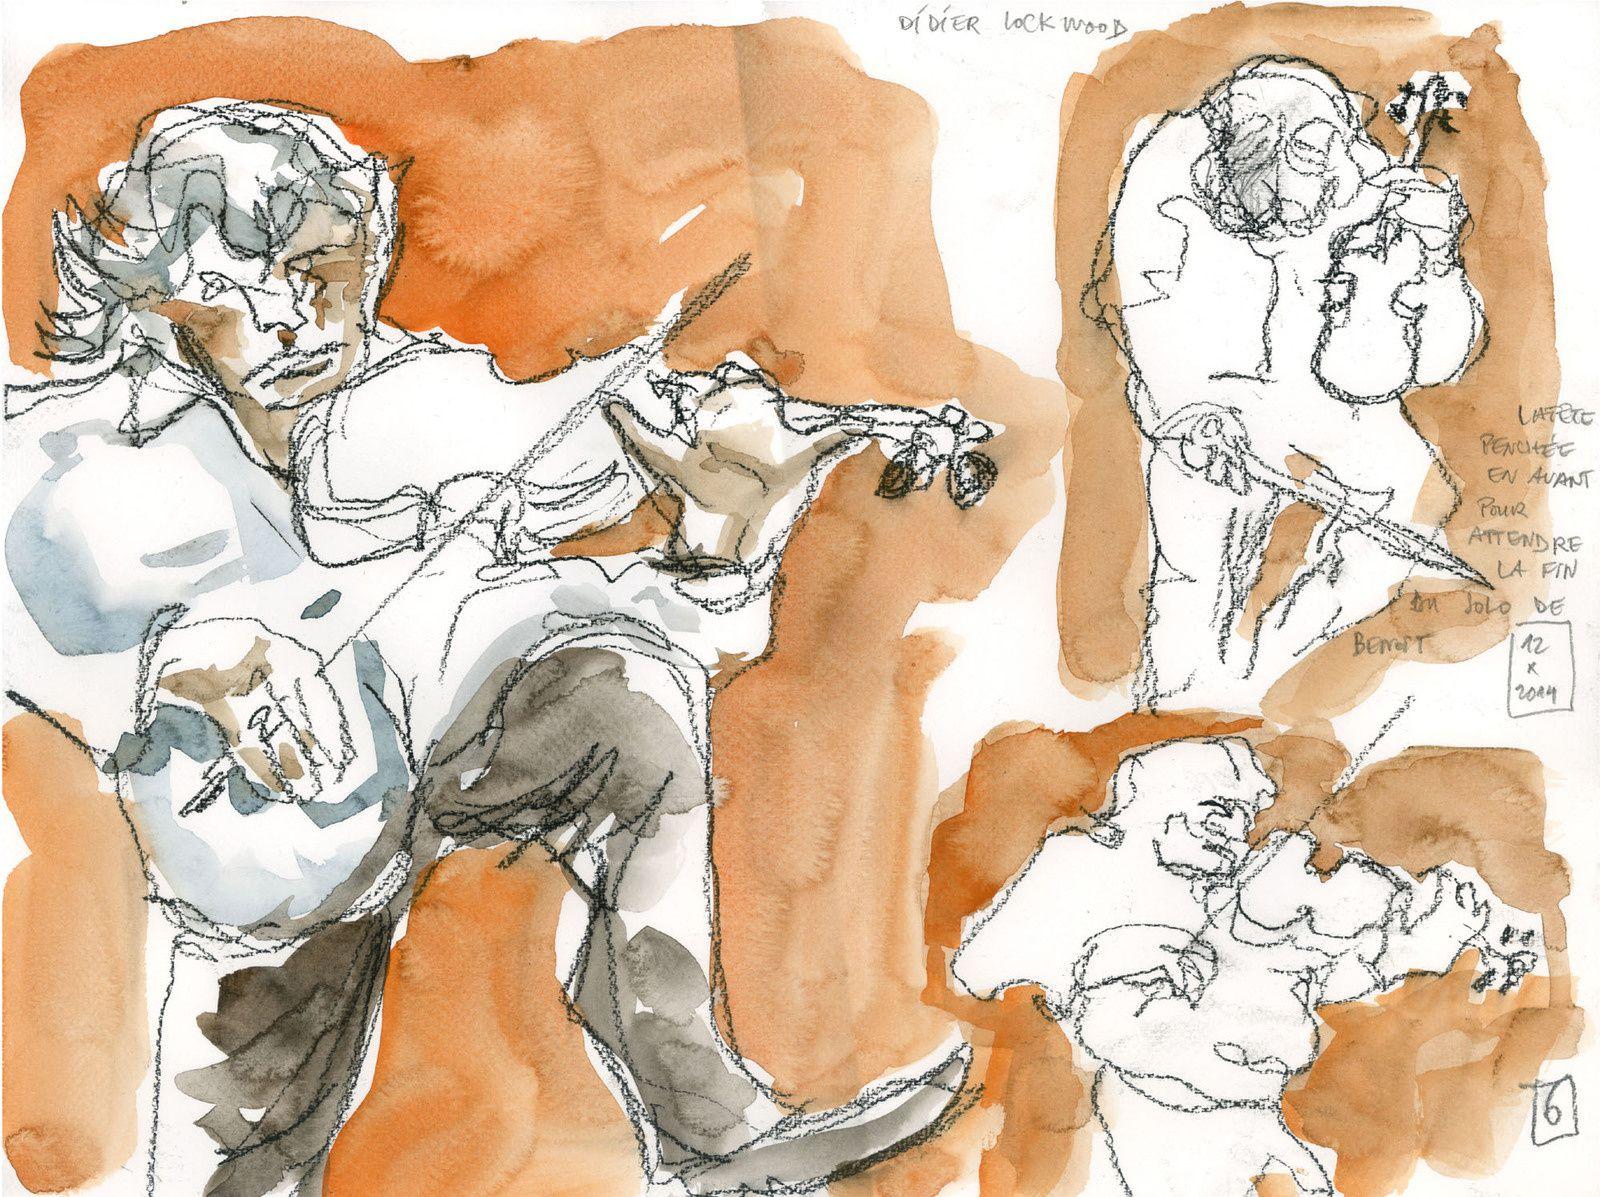 Didier Lockwood: un véritable voyage musical (Lagny Jazz festival 2014)